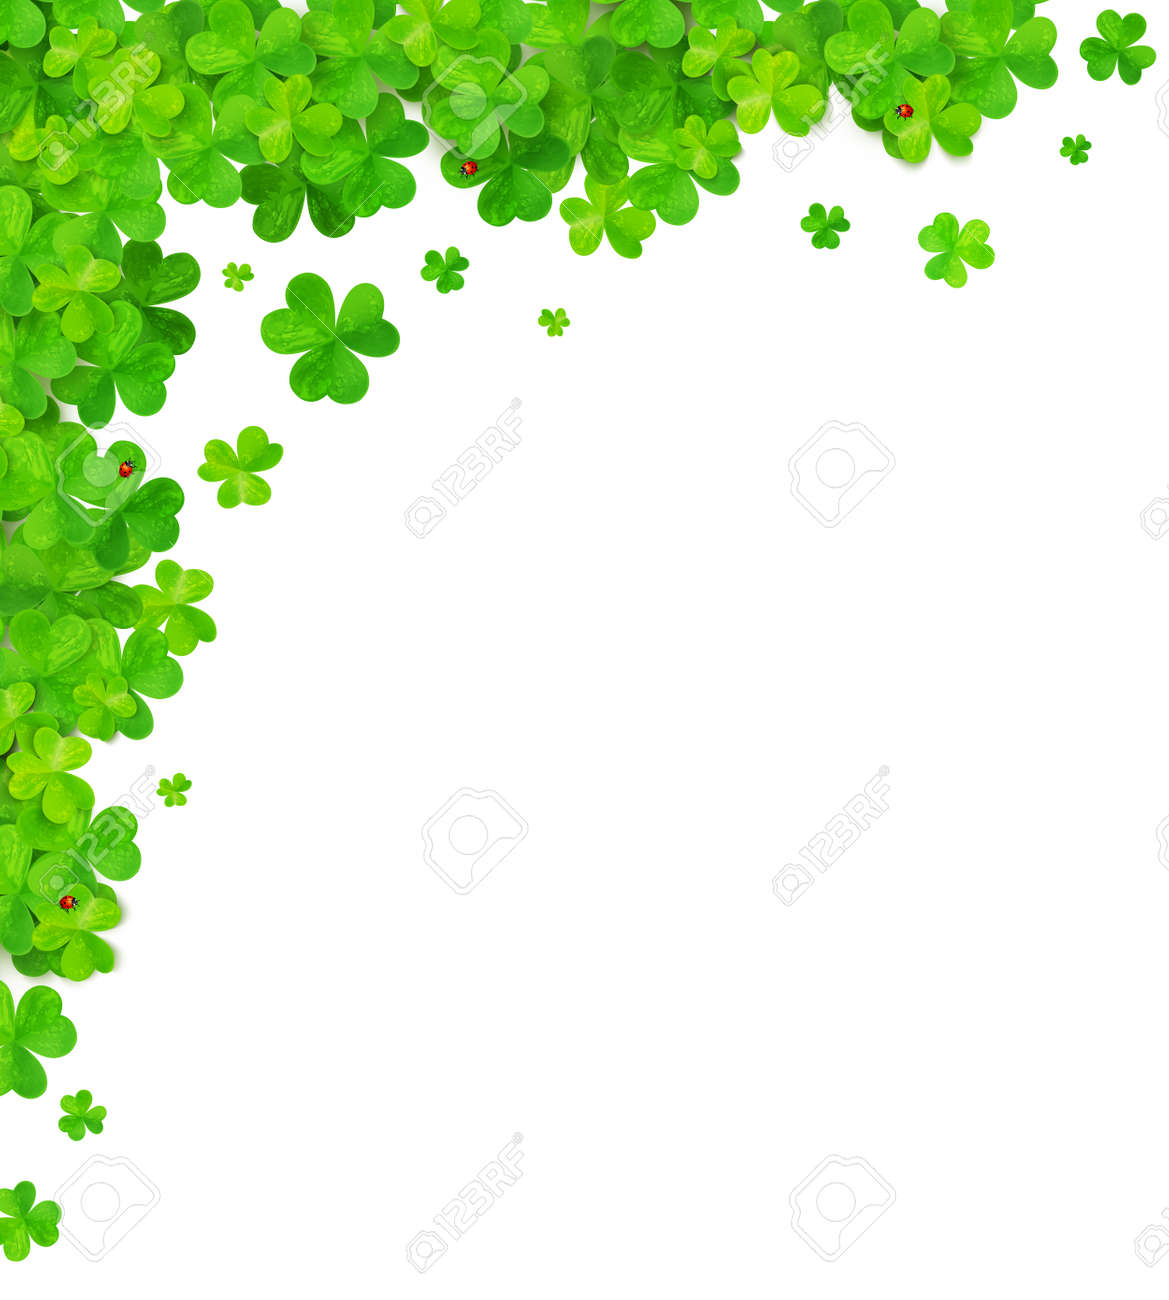 Tréboles Verdes Esquina De Vectores Elemento De Marco Ilustraciones ...